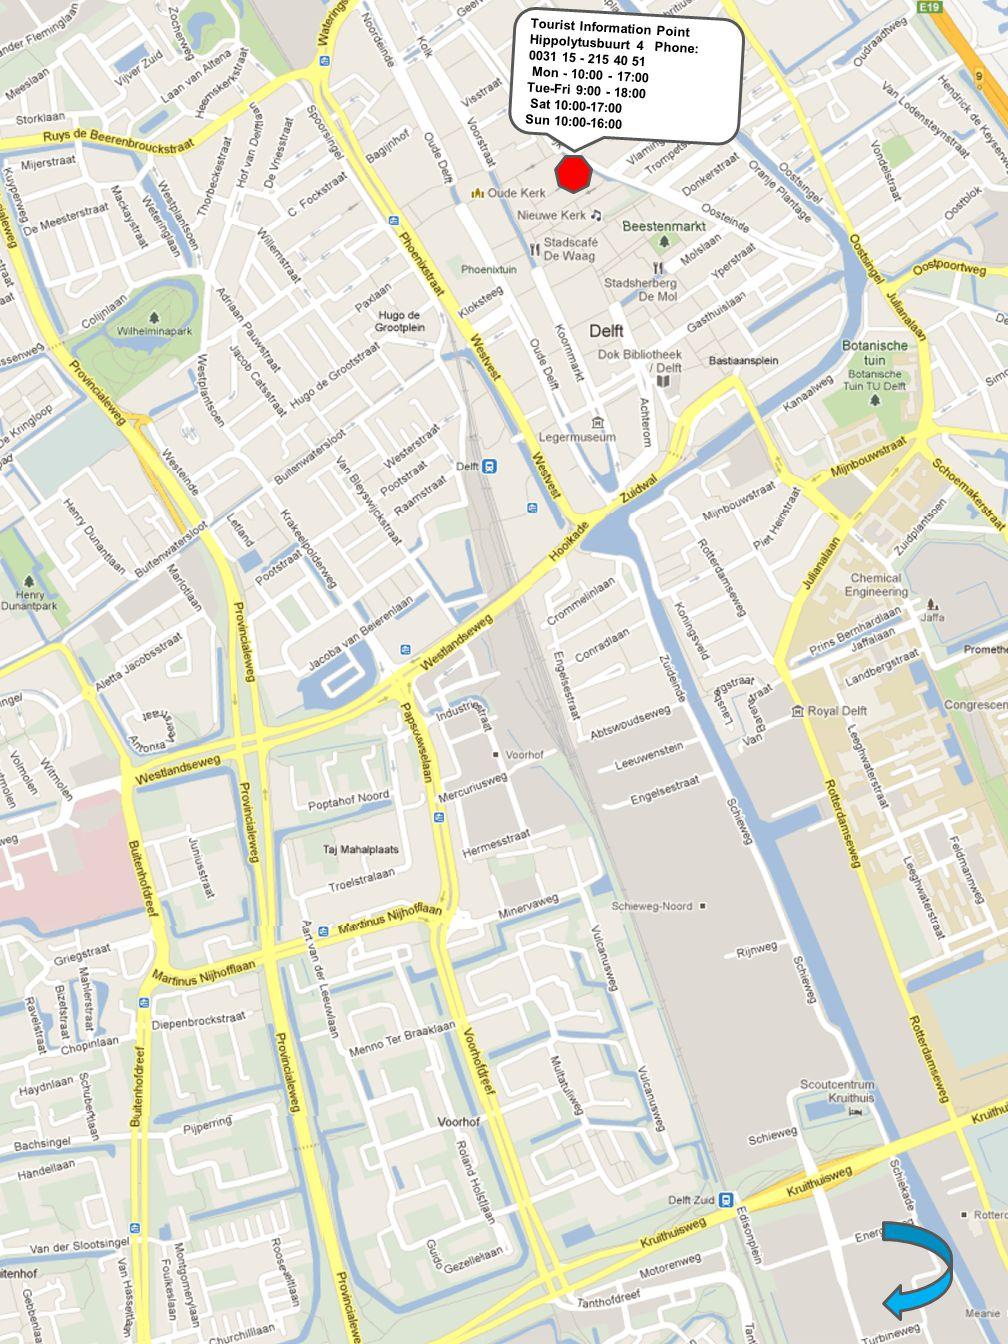 Tourist Information Point Hippolytusbuurt 4 Phone: 0031 15 - 215 40 51 Mon - 10:00 - 17:00 Tue-Fri 9:00 - 18:00 Sat 10:00-17:00 Sun 10:00-16:00